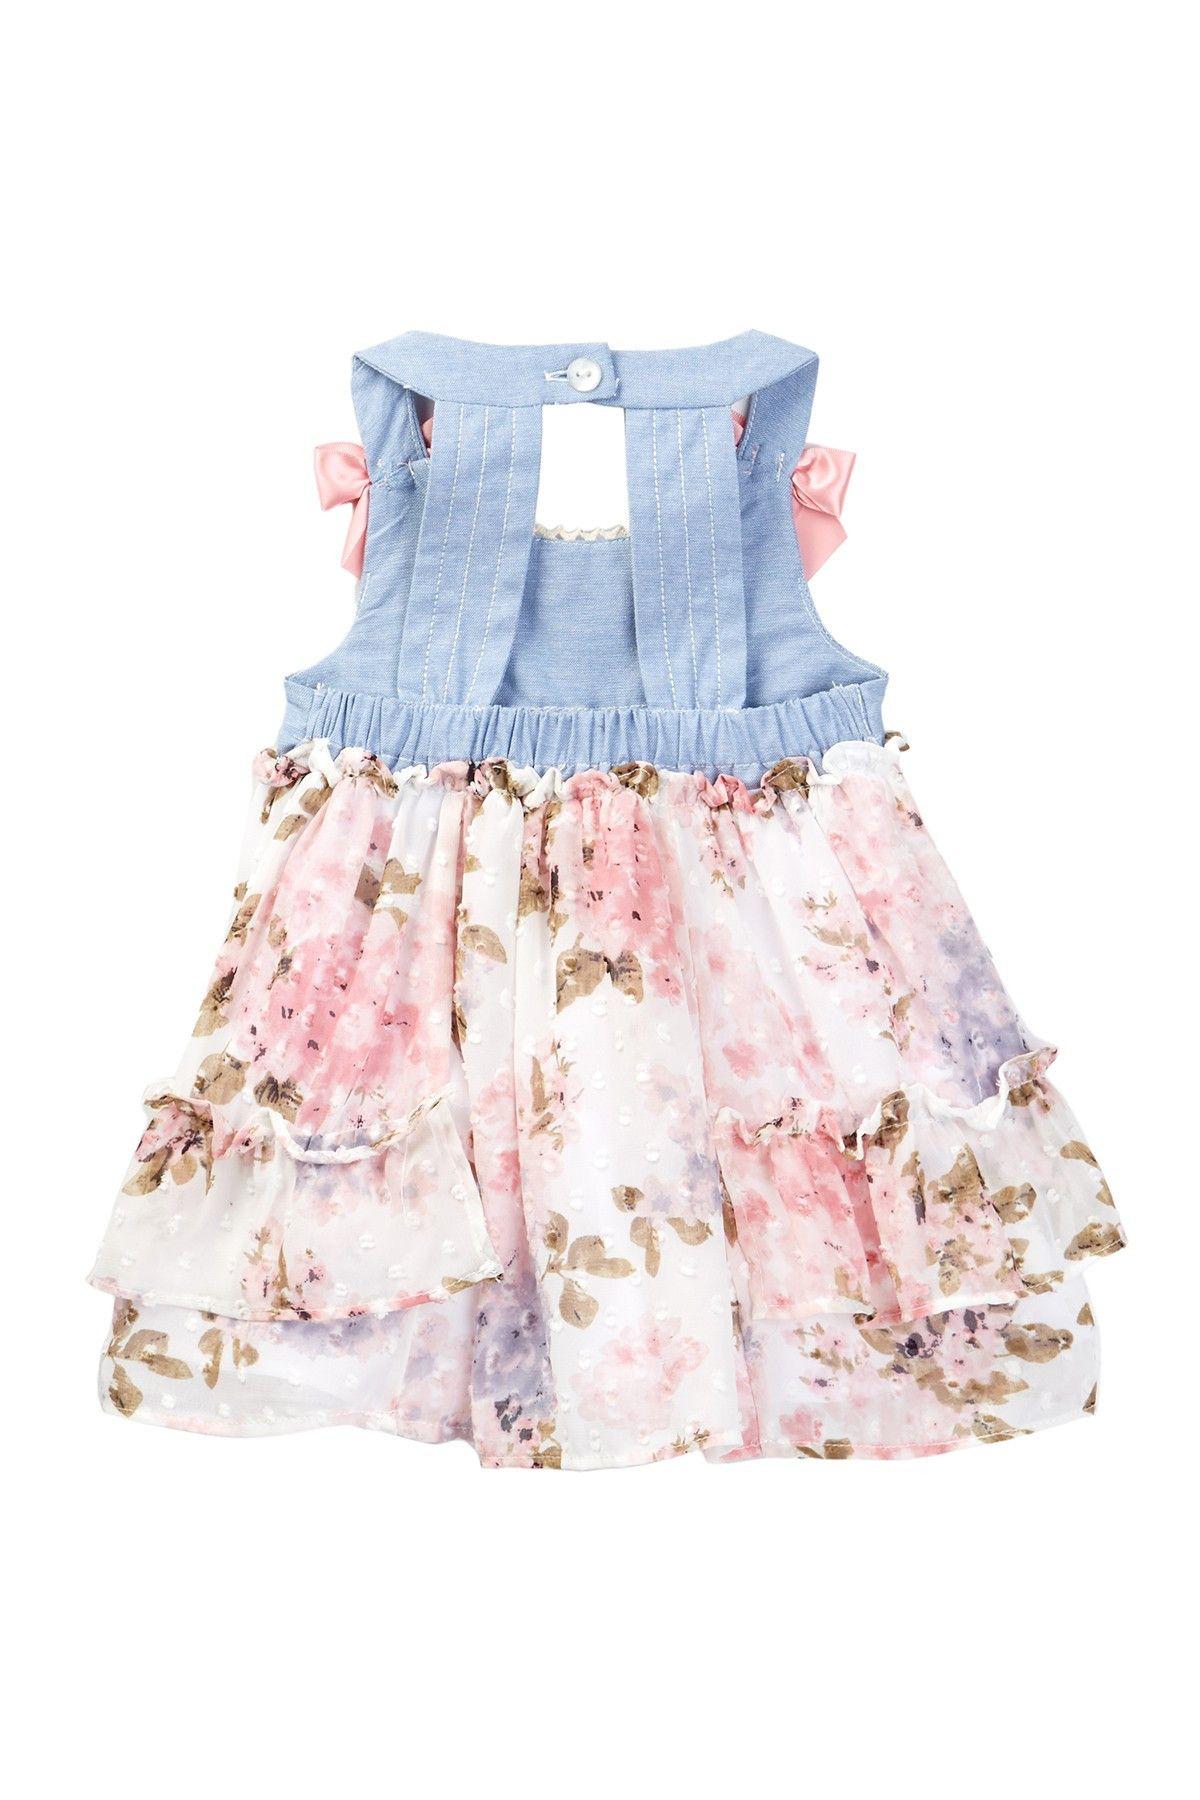 Iris & Ivy Open Chambray Dress & Bloomer Set Baby Girls at